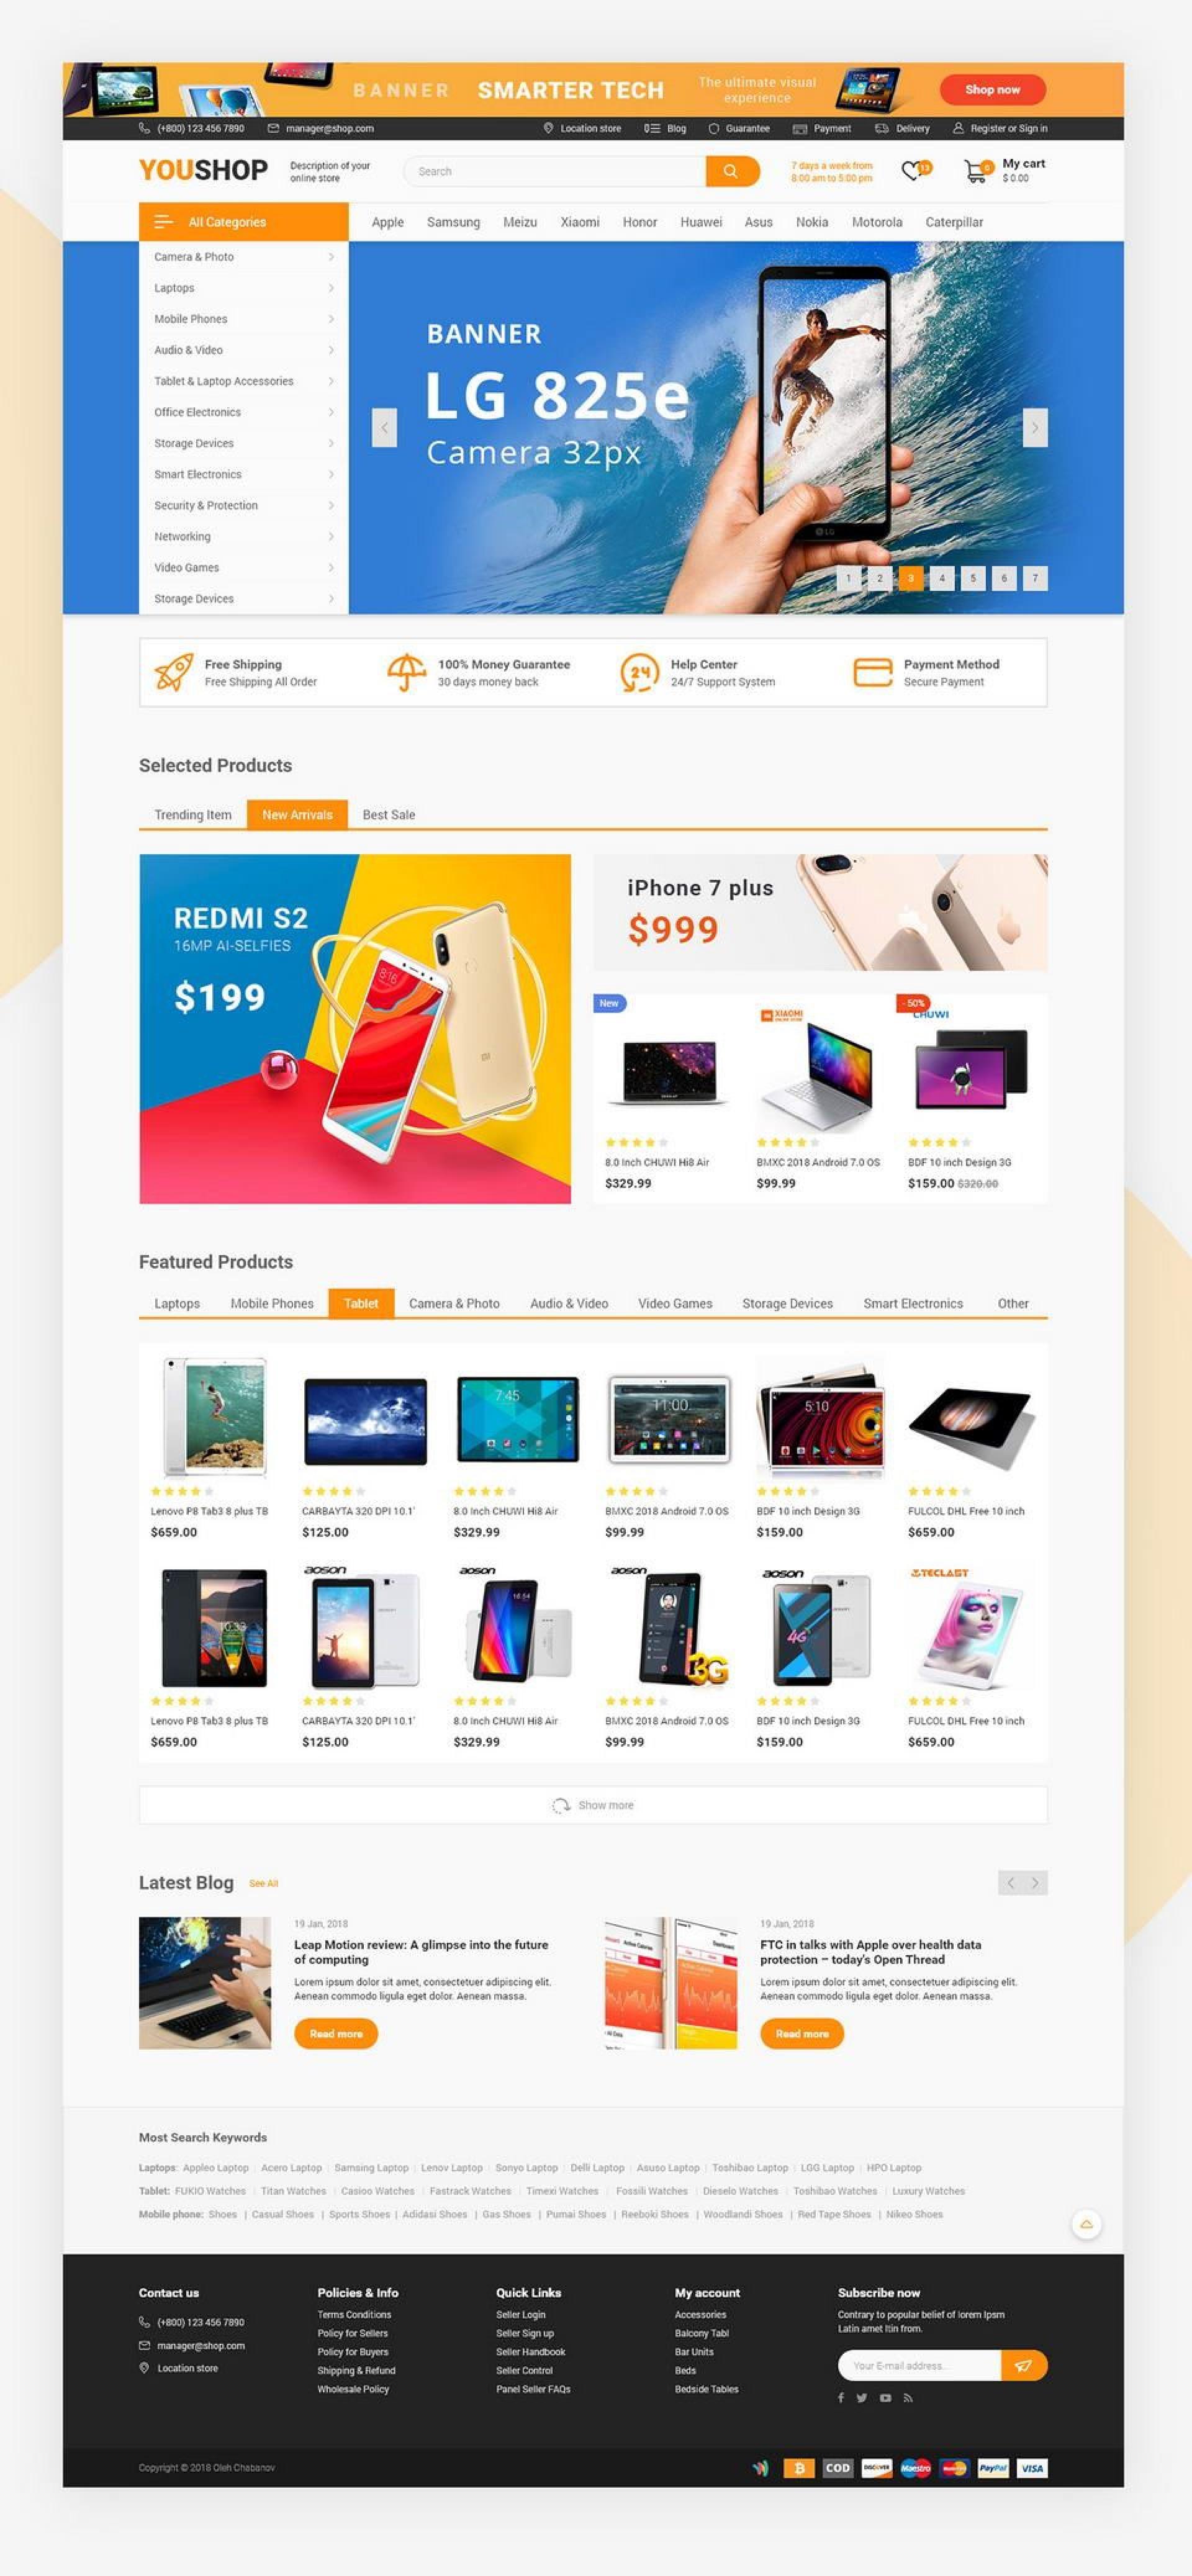 006 Astounding Free E Commerce Website Template Image  Ecommerce Html Cs Bootstrap Php1920